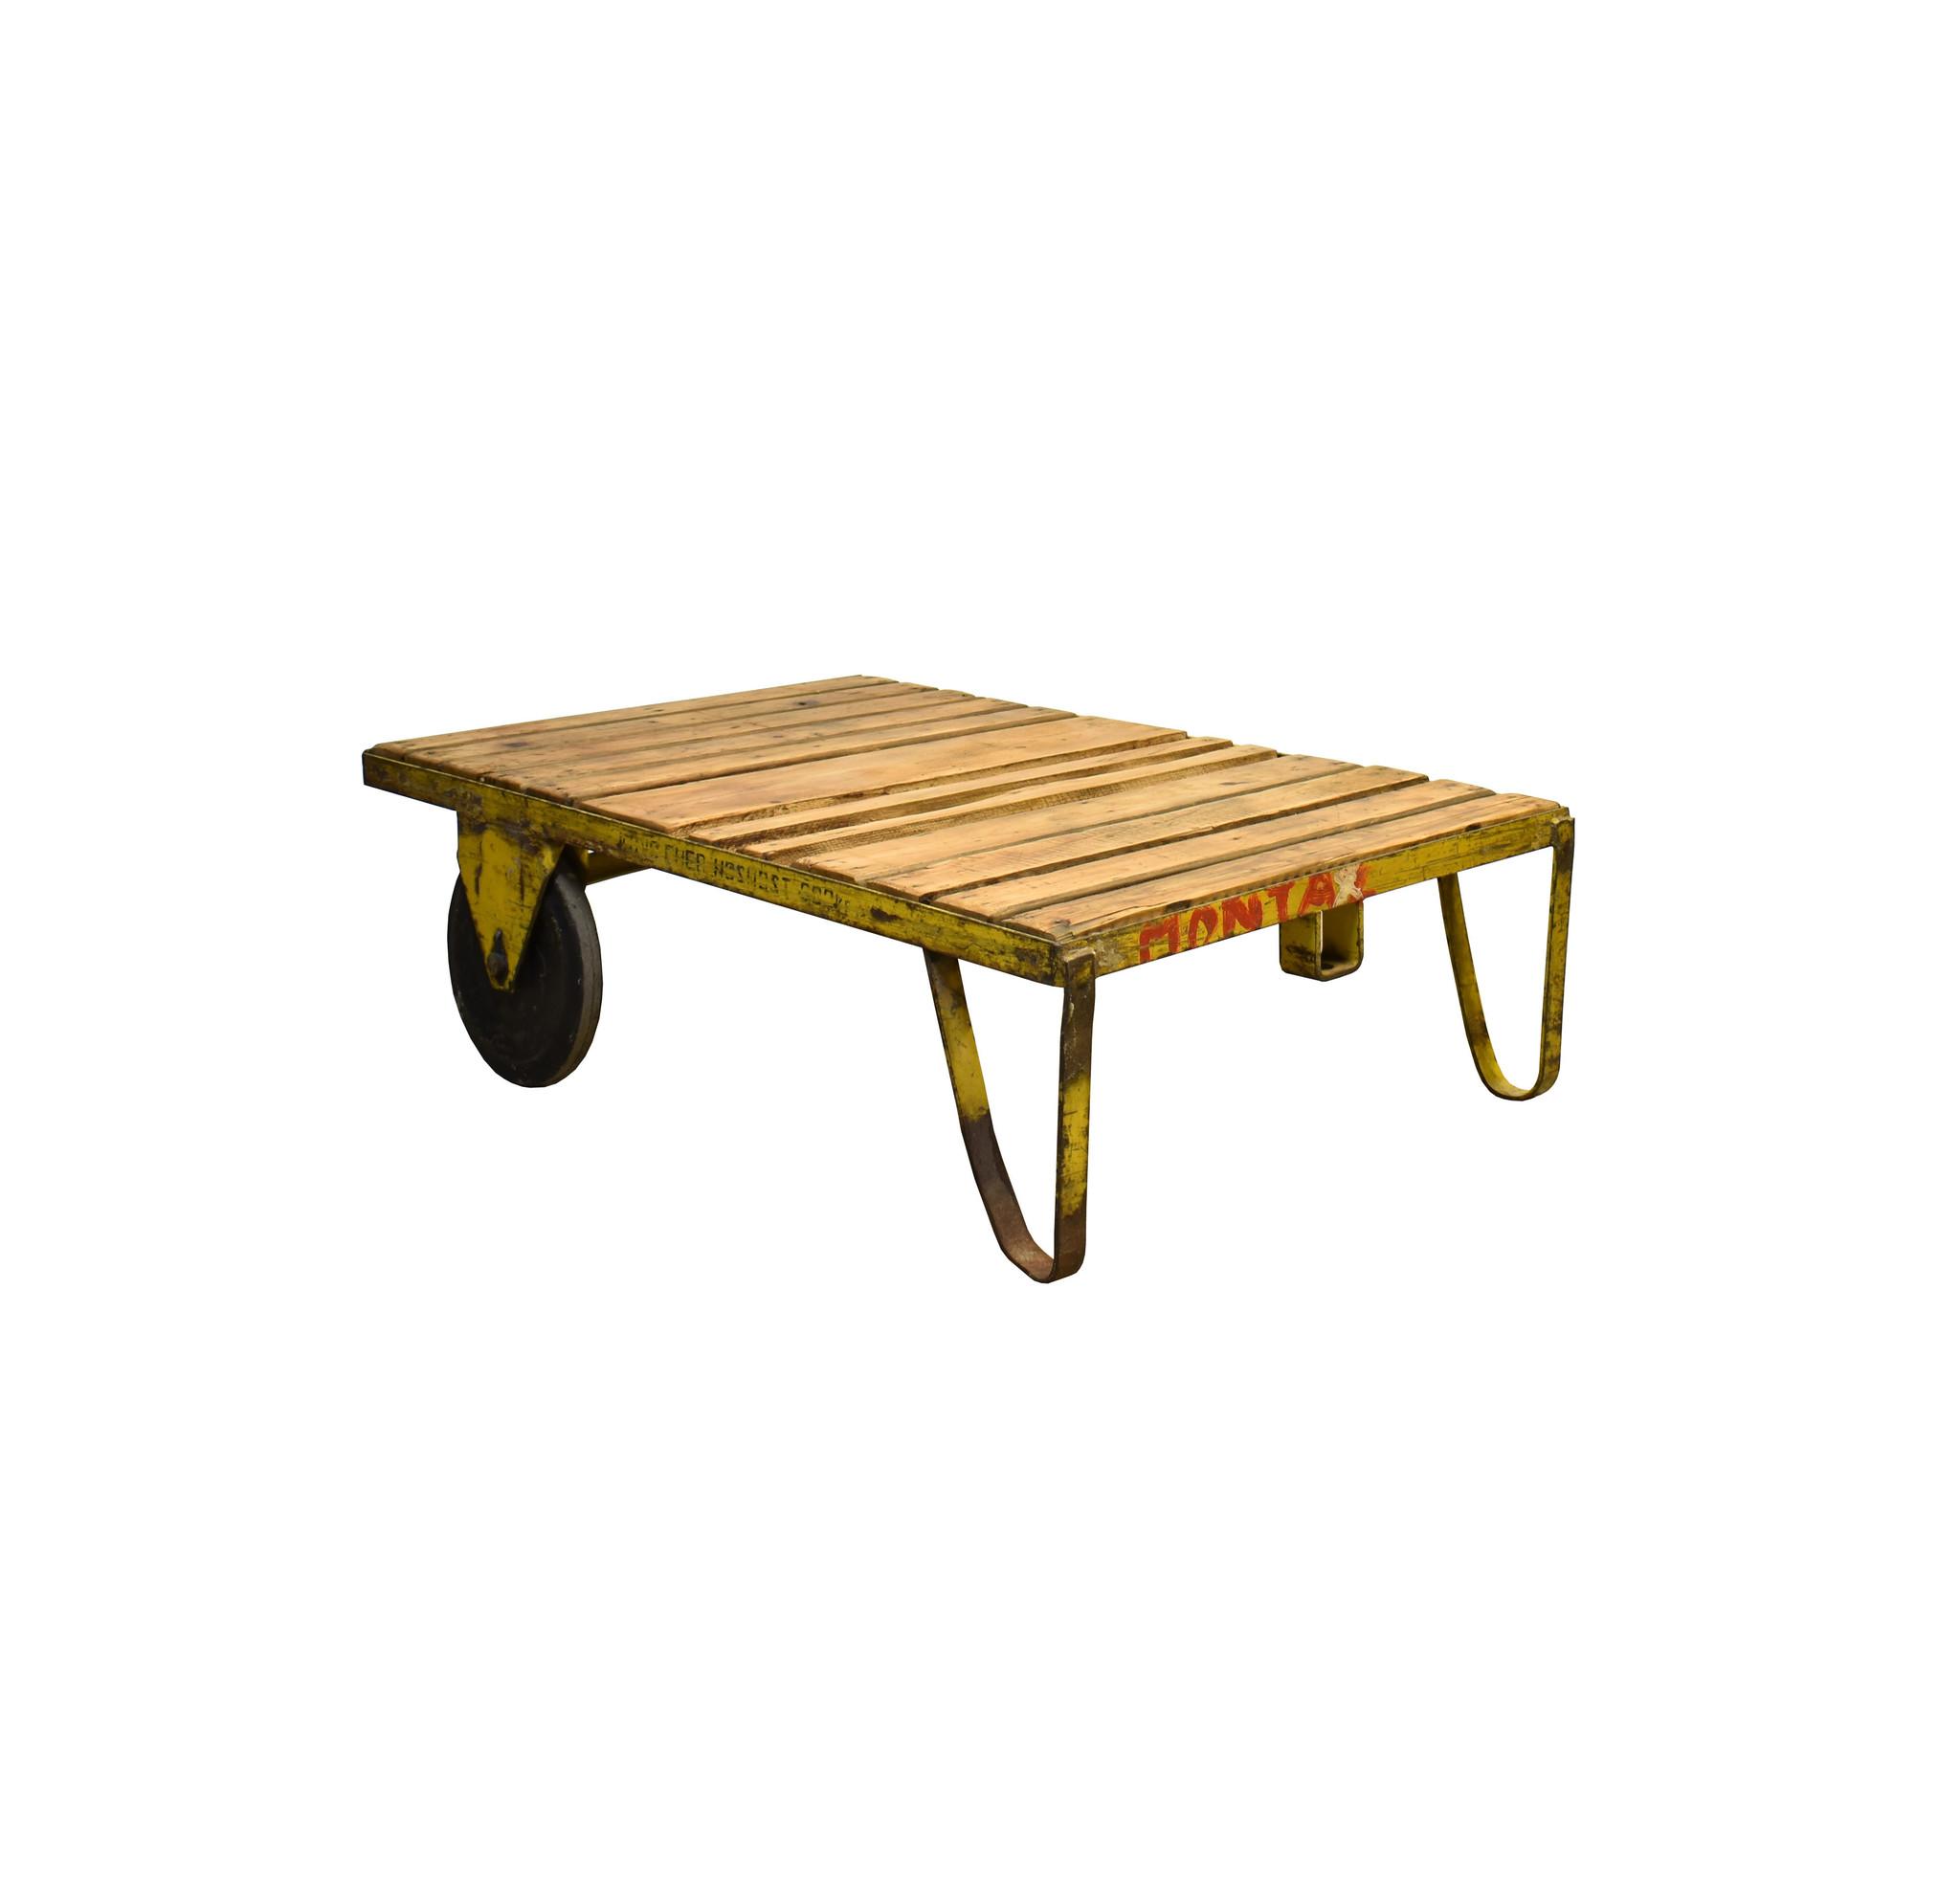 Industriële oude houten trolley met metalen onderstel en wielen